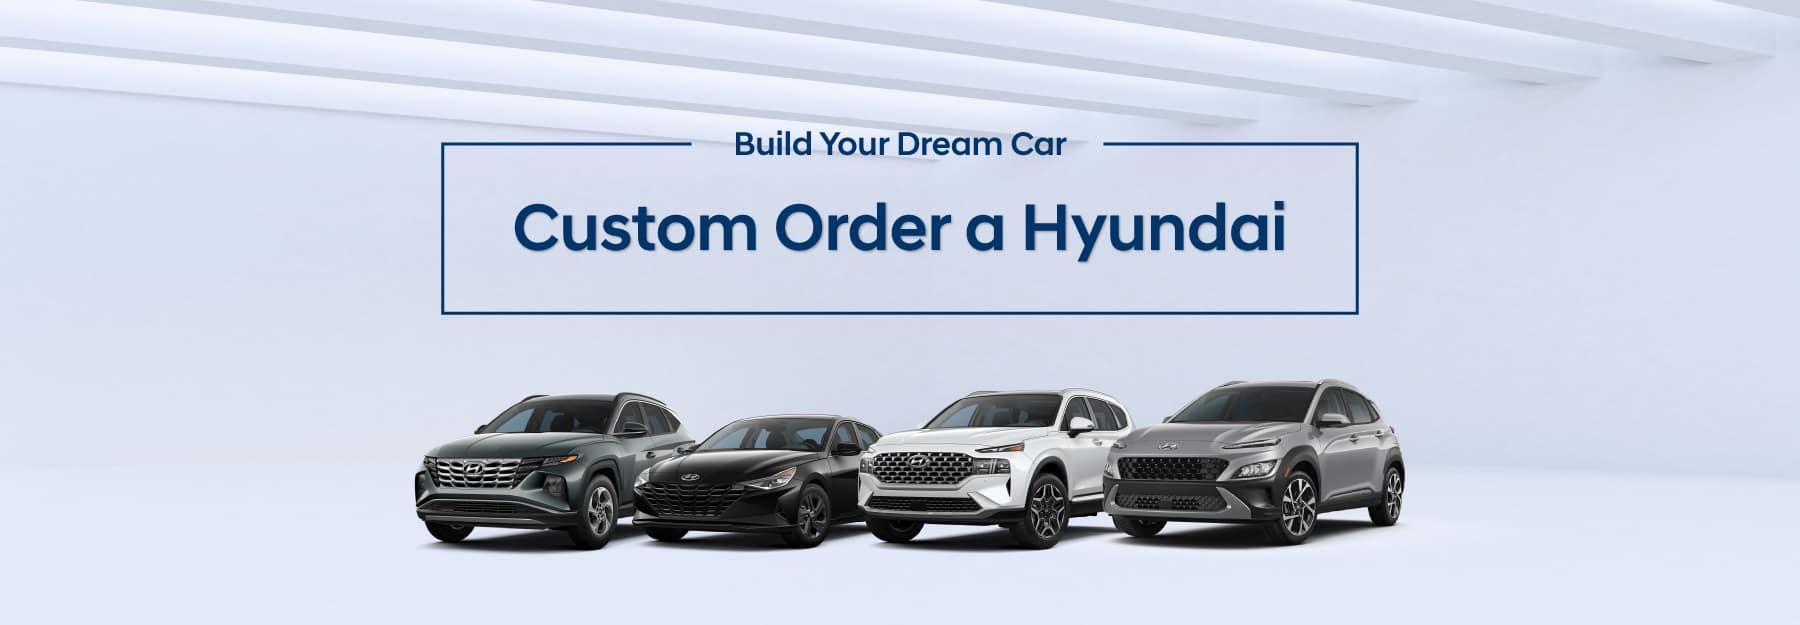 Build Your Dream Car - Custom Order a Hyundai from Centennial Hyundai